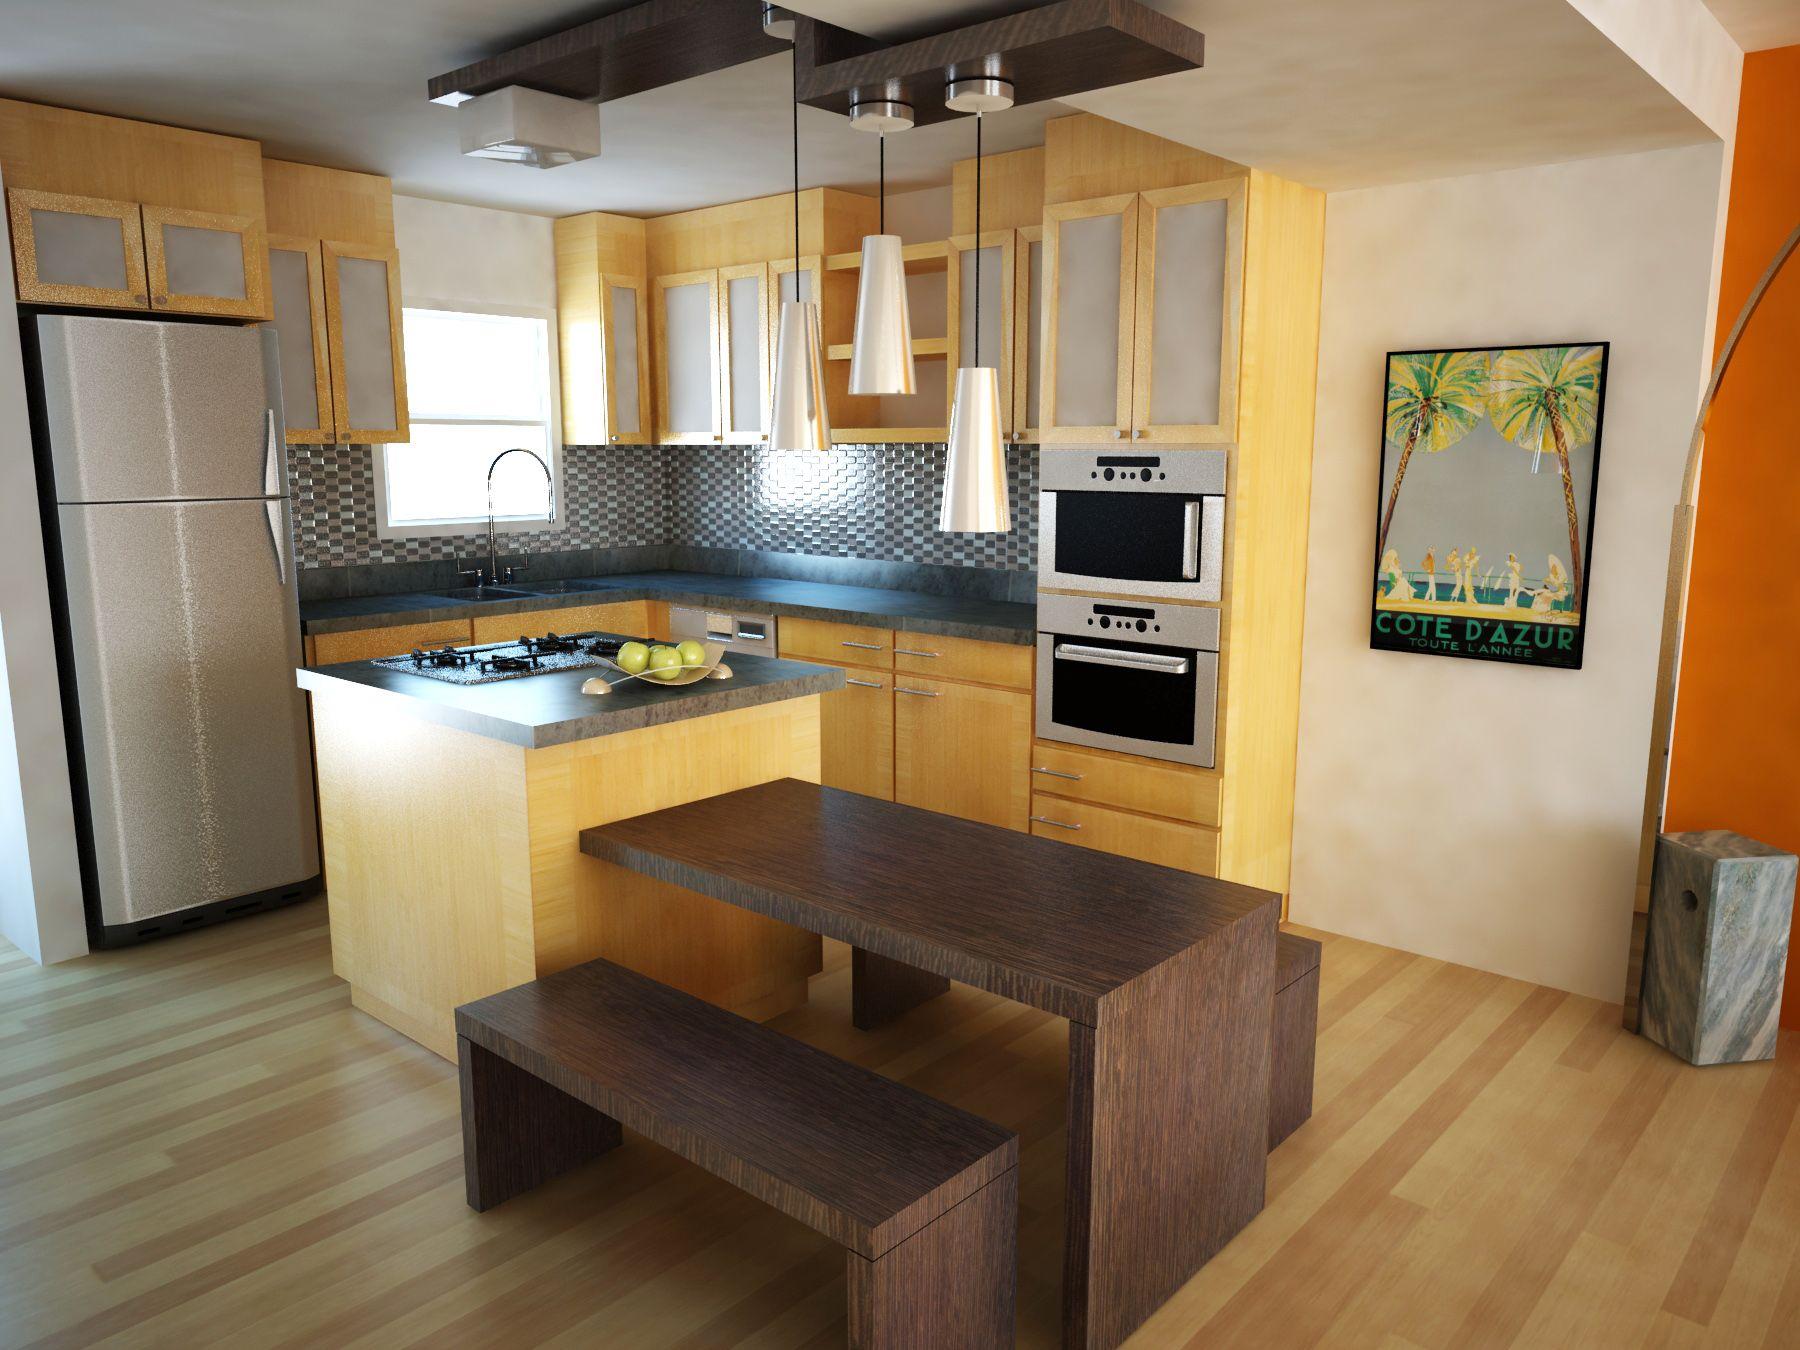 Pin by justin sheckler on kitchens pinterest kitchen design